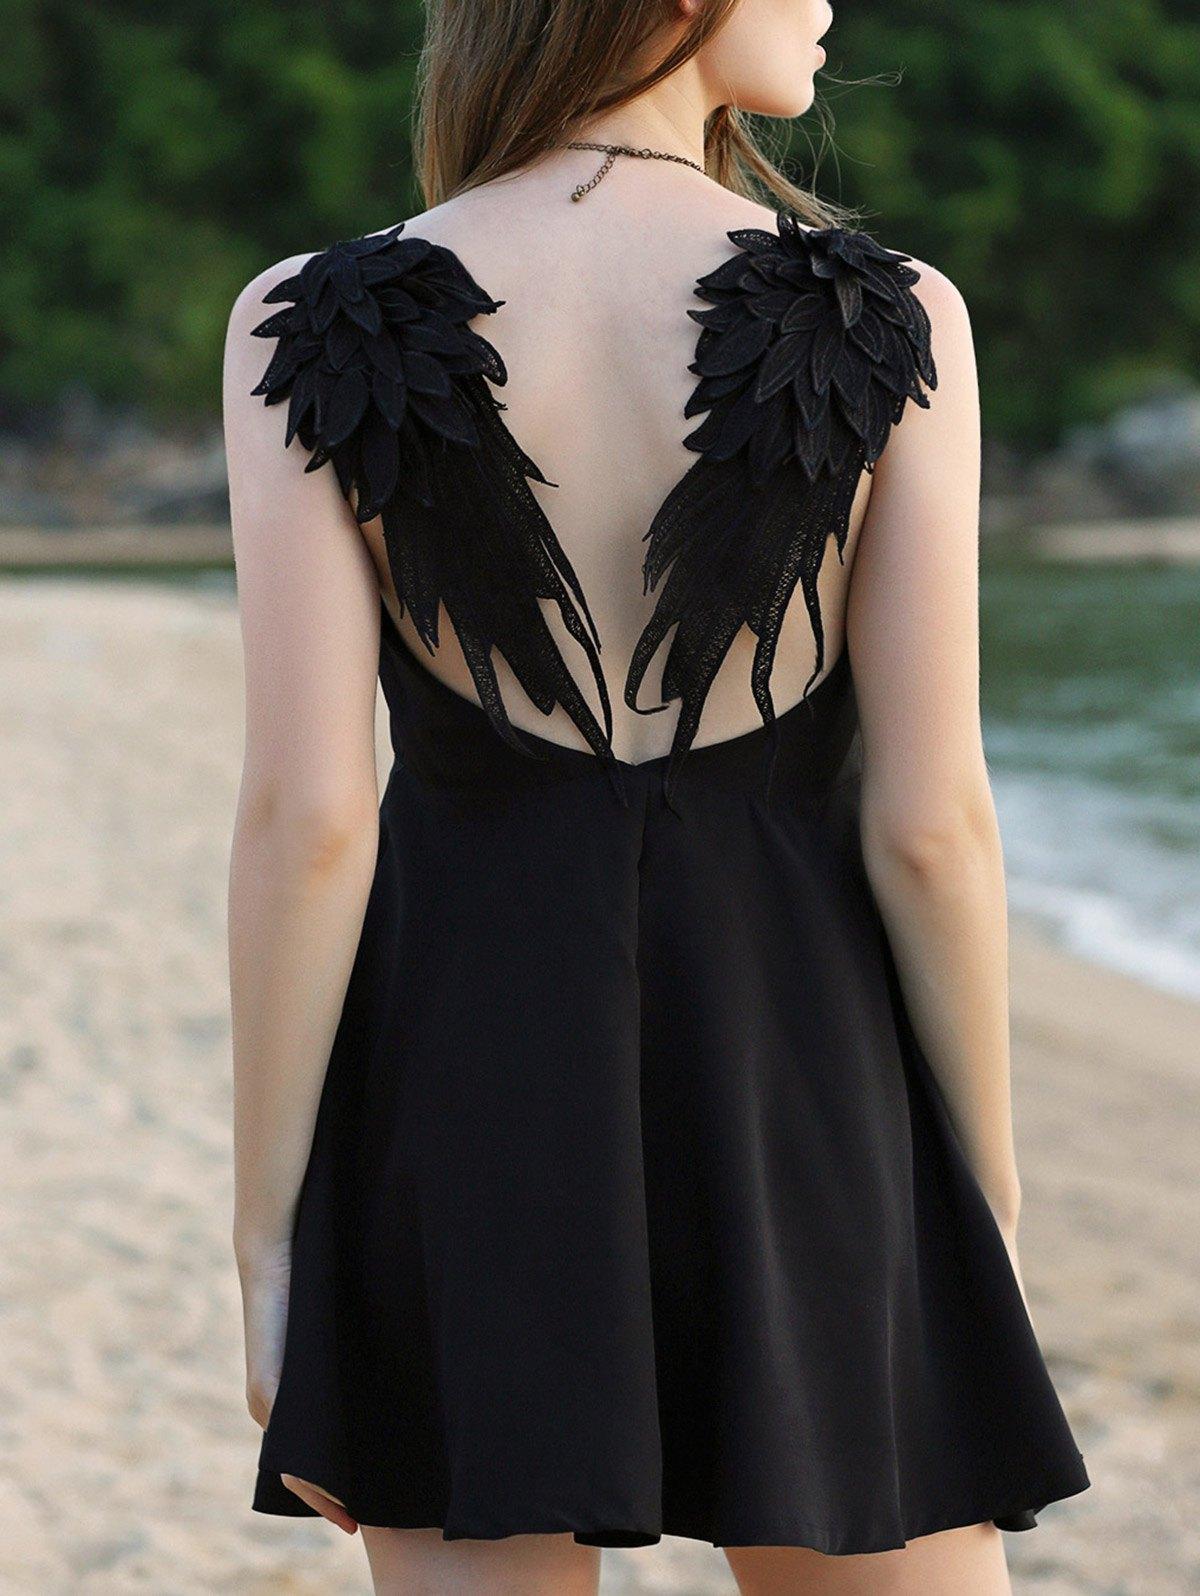 http://www.zaful.com/wing-embroidery-sleeveless-flare-dress-p_191302.html?lkid=19609